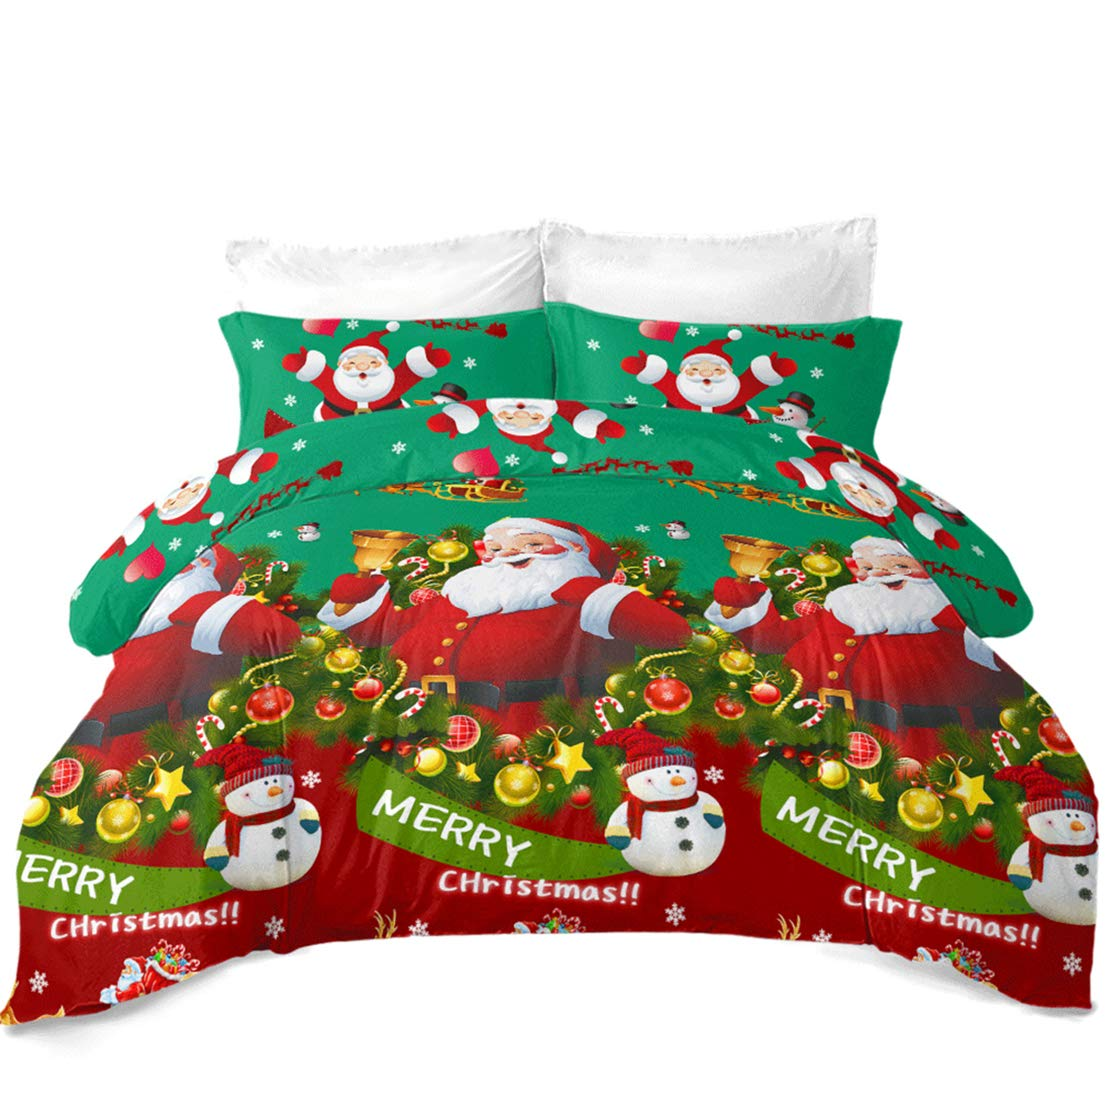 JARSON 4Pcs 3D Green Christmas Bedding Set King Size,Cartoon Santa Claus Duvet Cover Set Kids Festival Bedding for New Year Decoration by JARSON